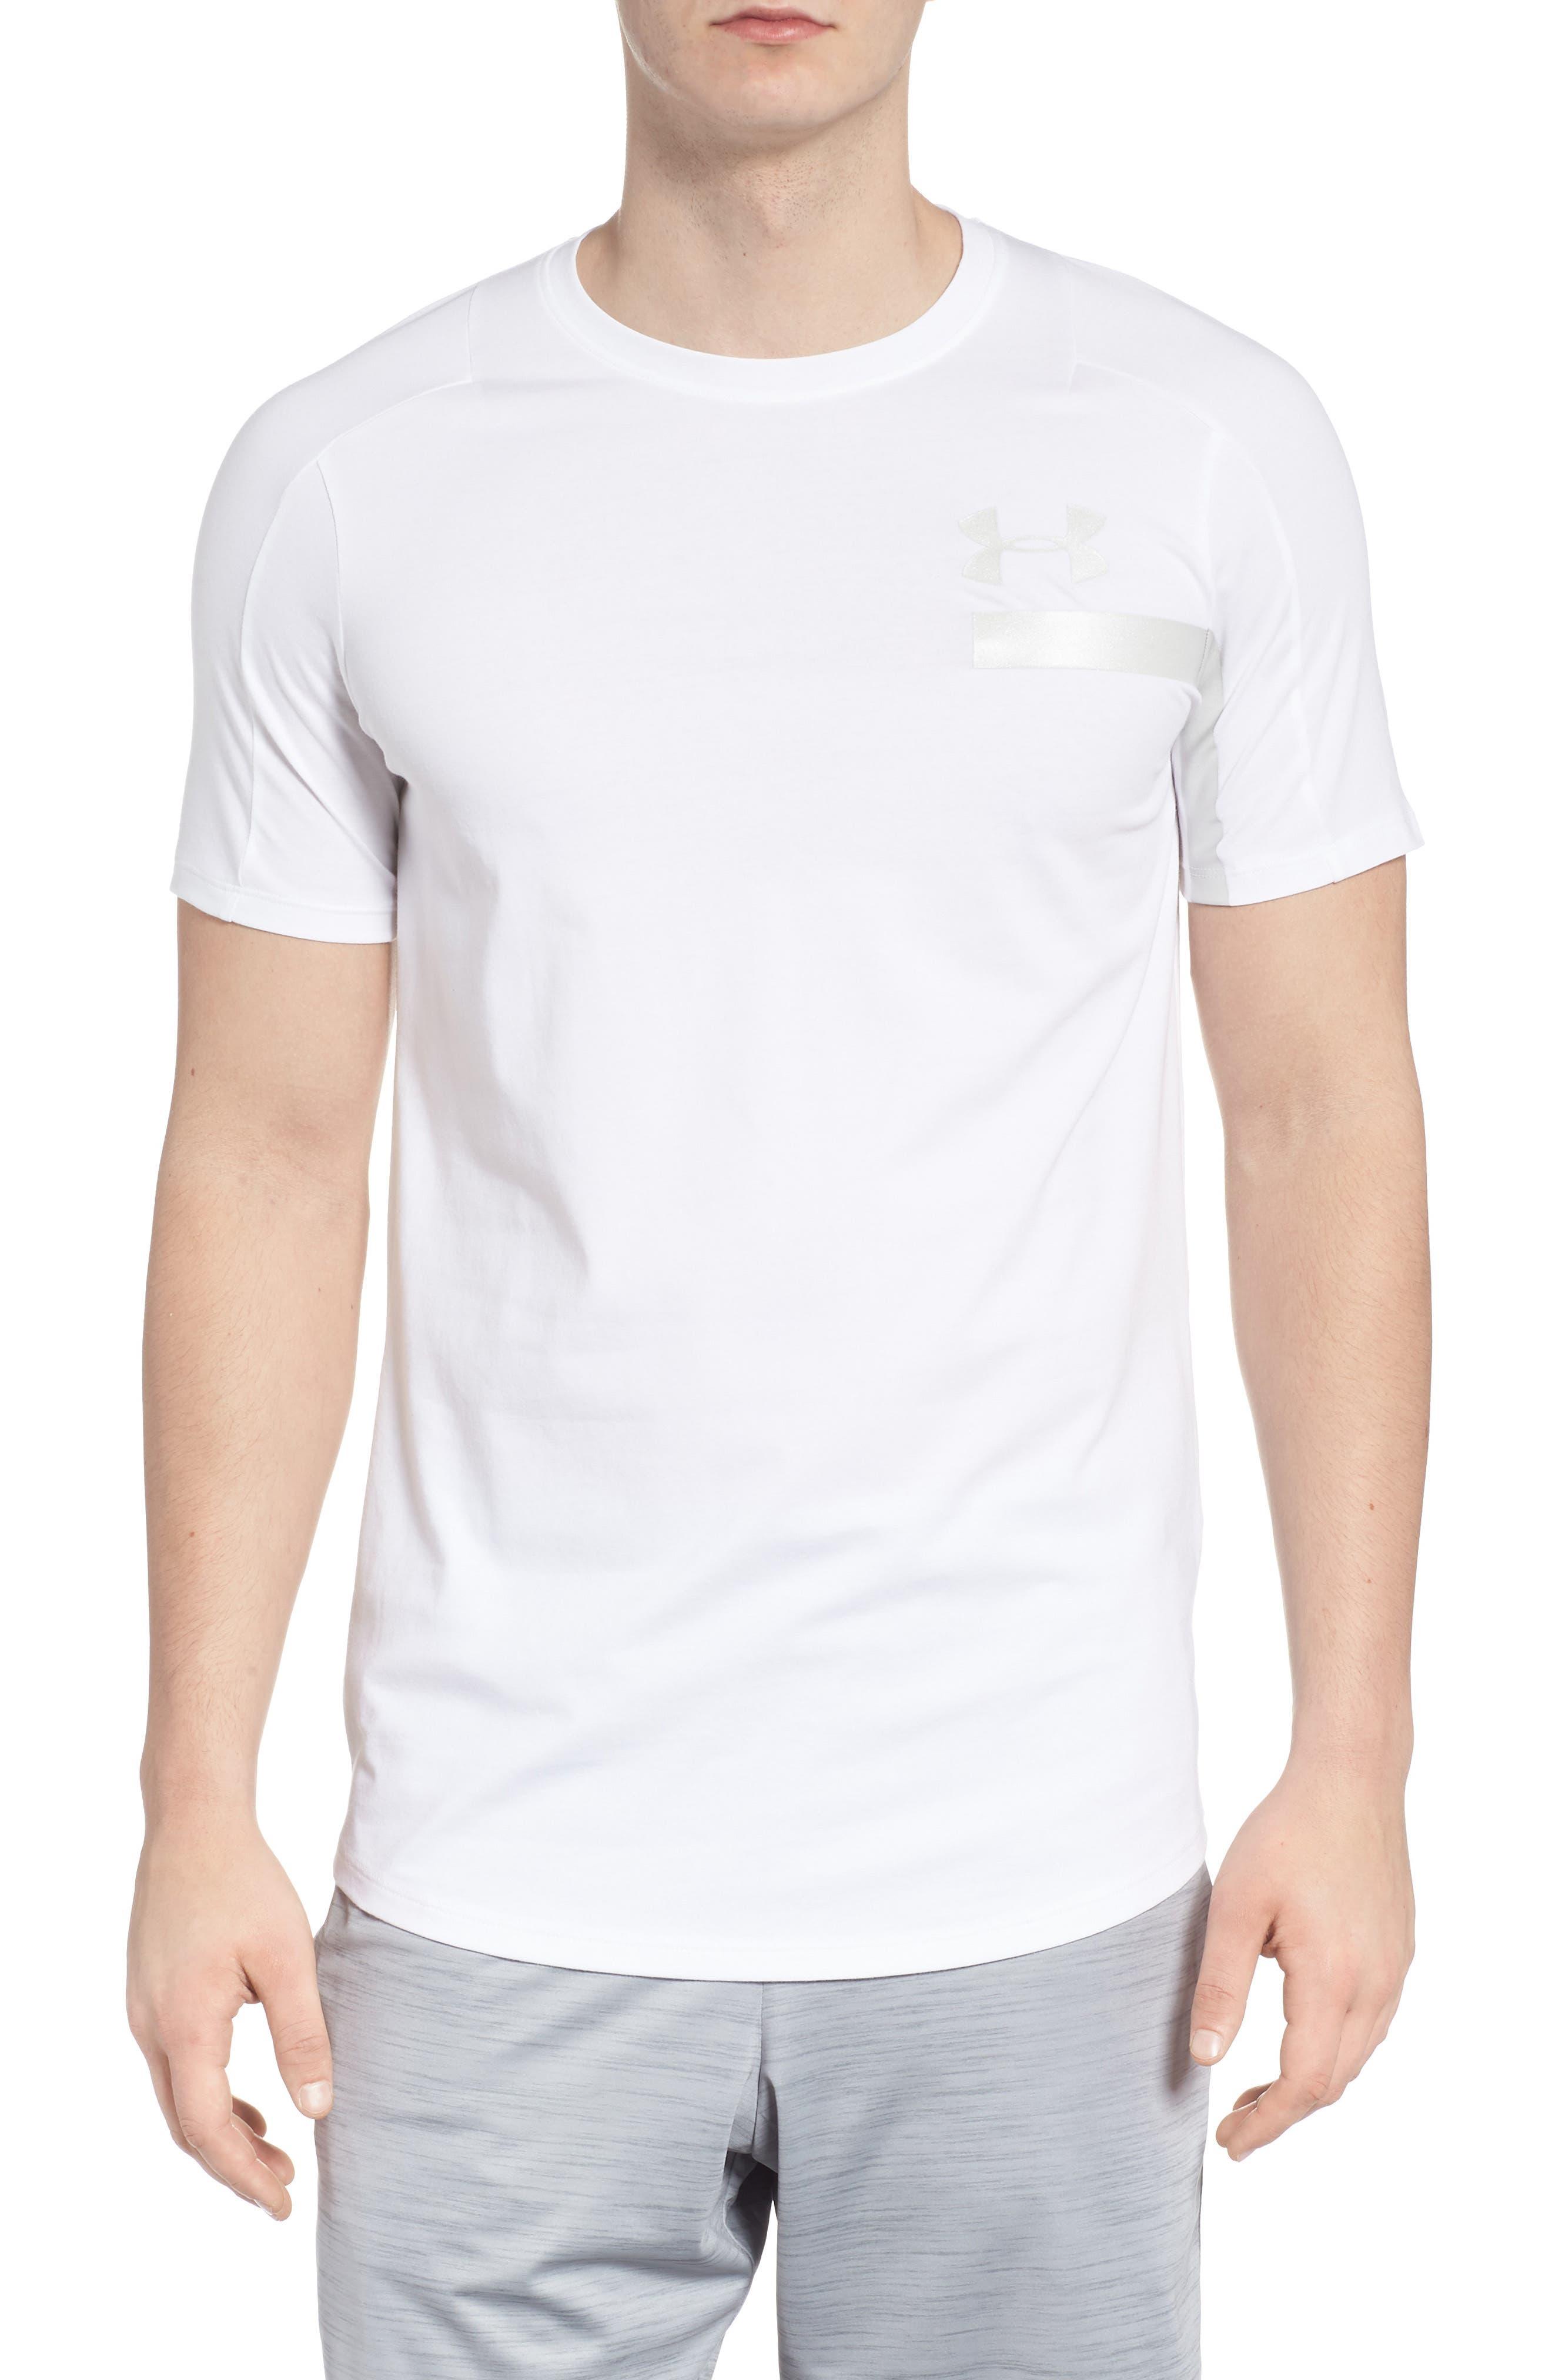 Perpetual Crewneck T-Shirt,                             Main thumbnail 1, color,                             White/ White